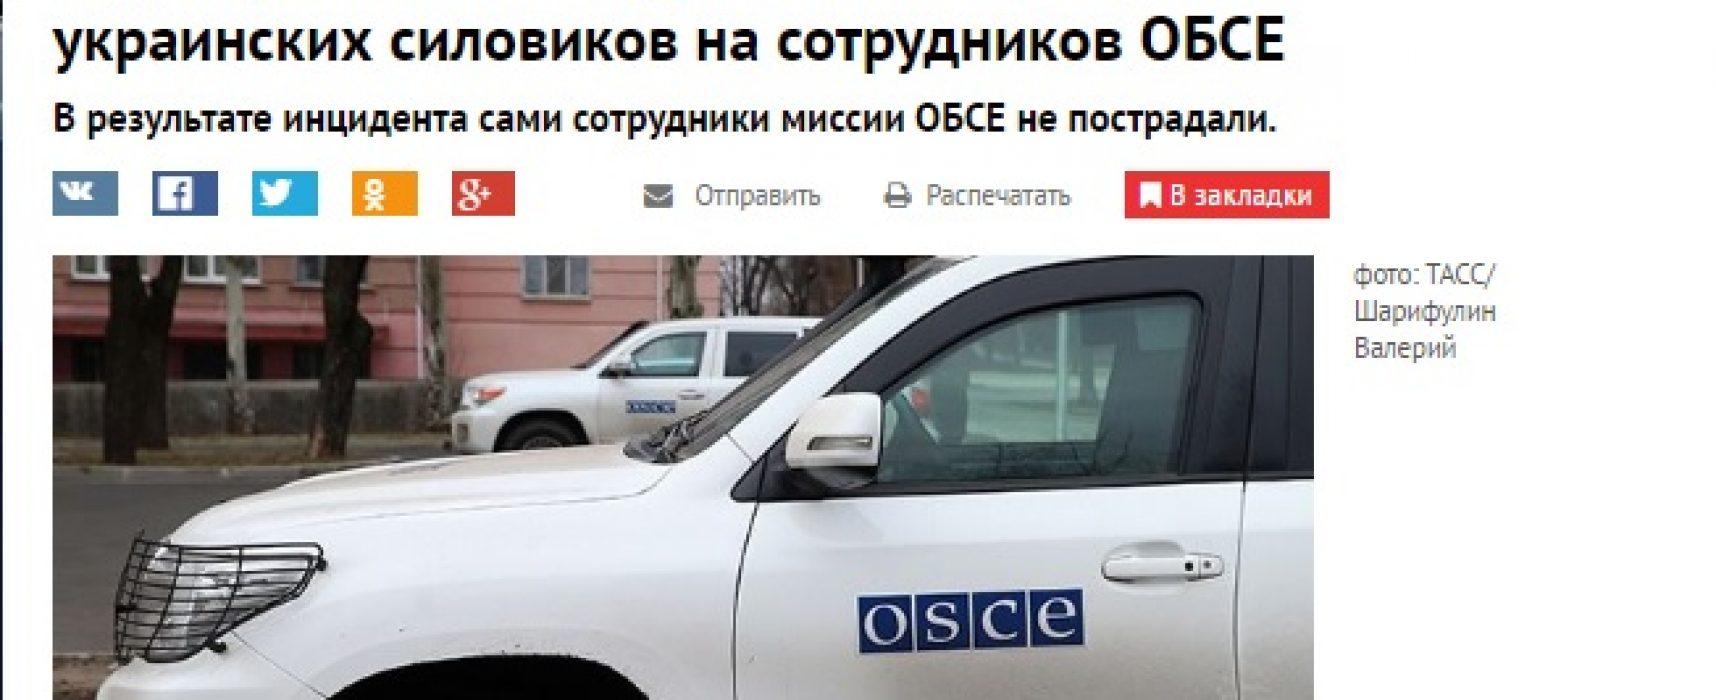 Fake: Ukrainian Military Shell OSCE Mission